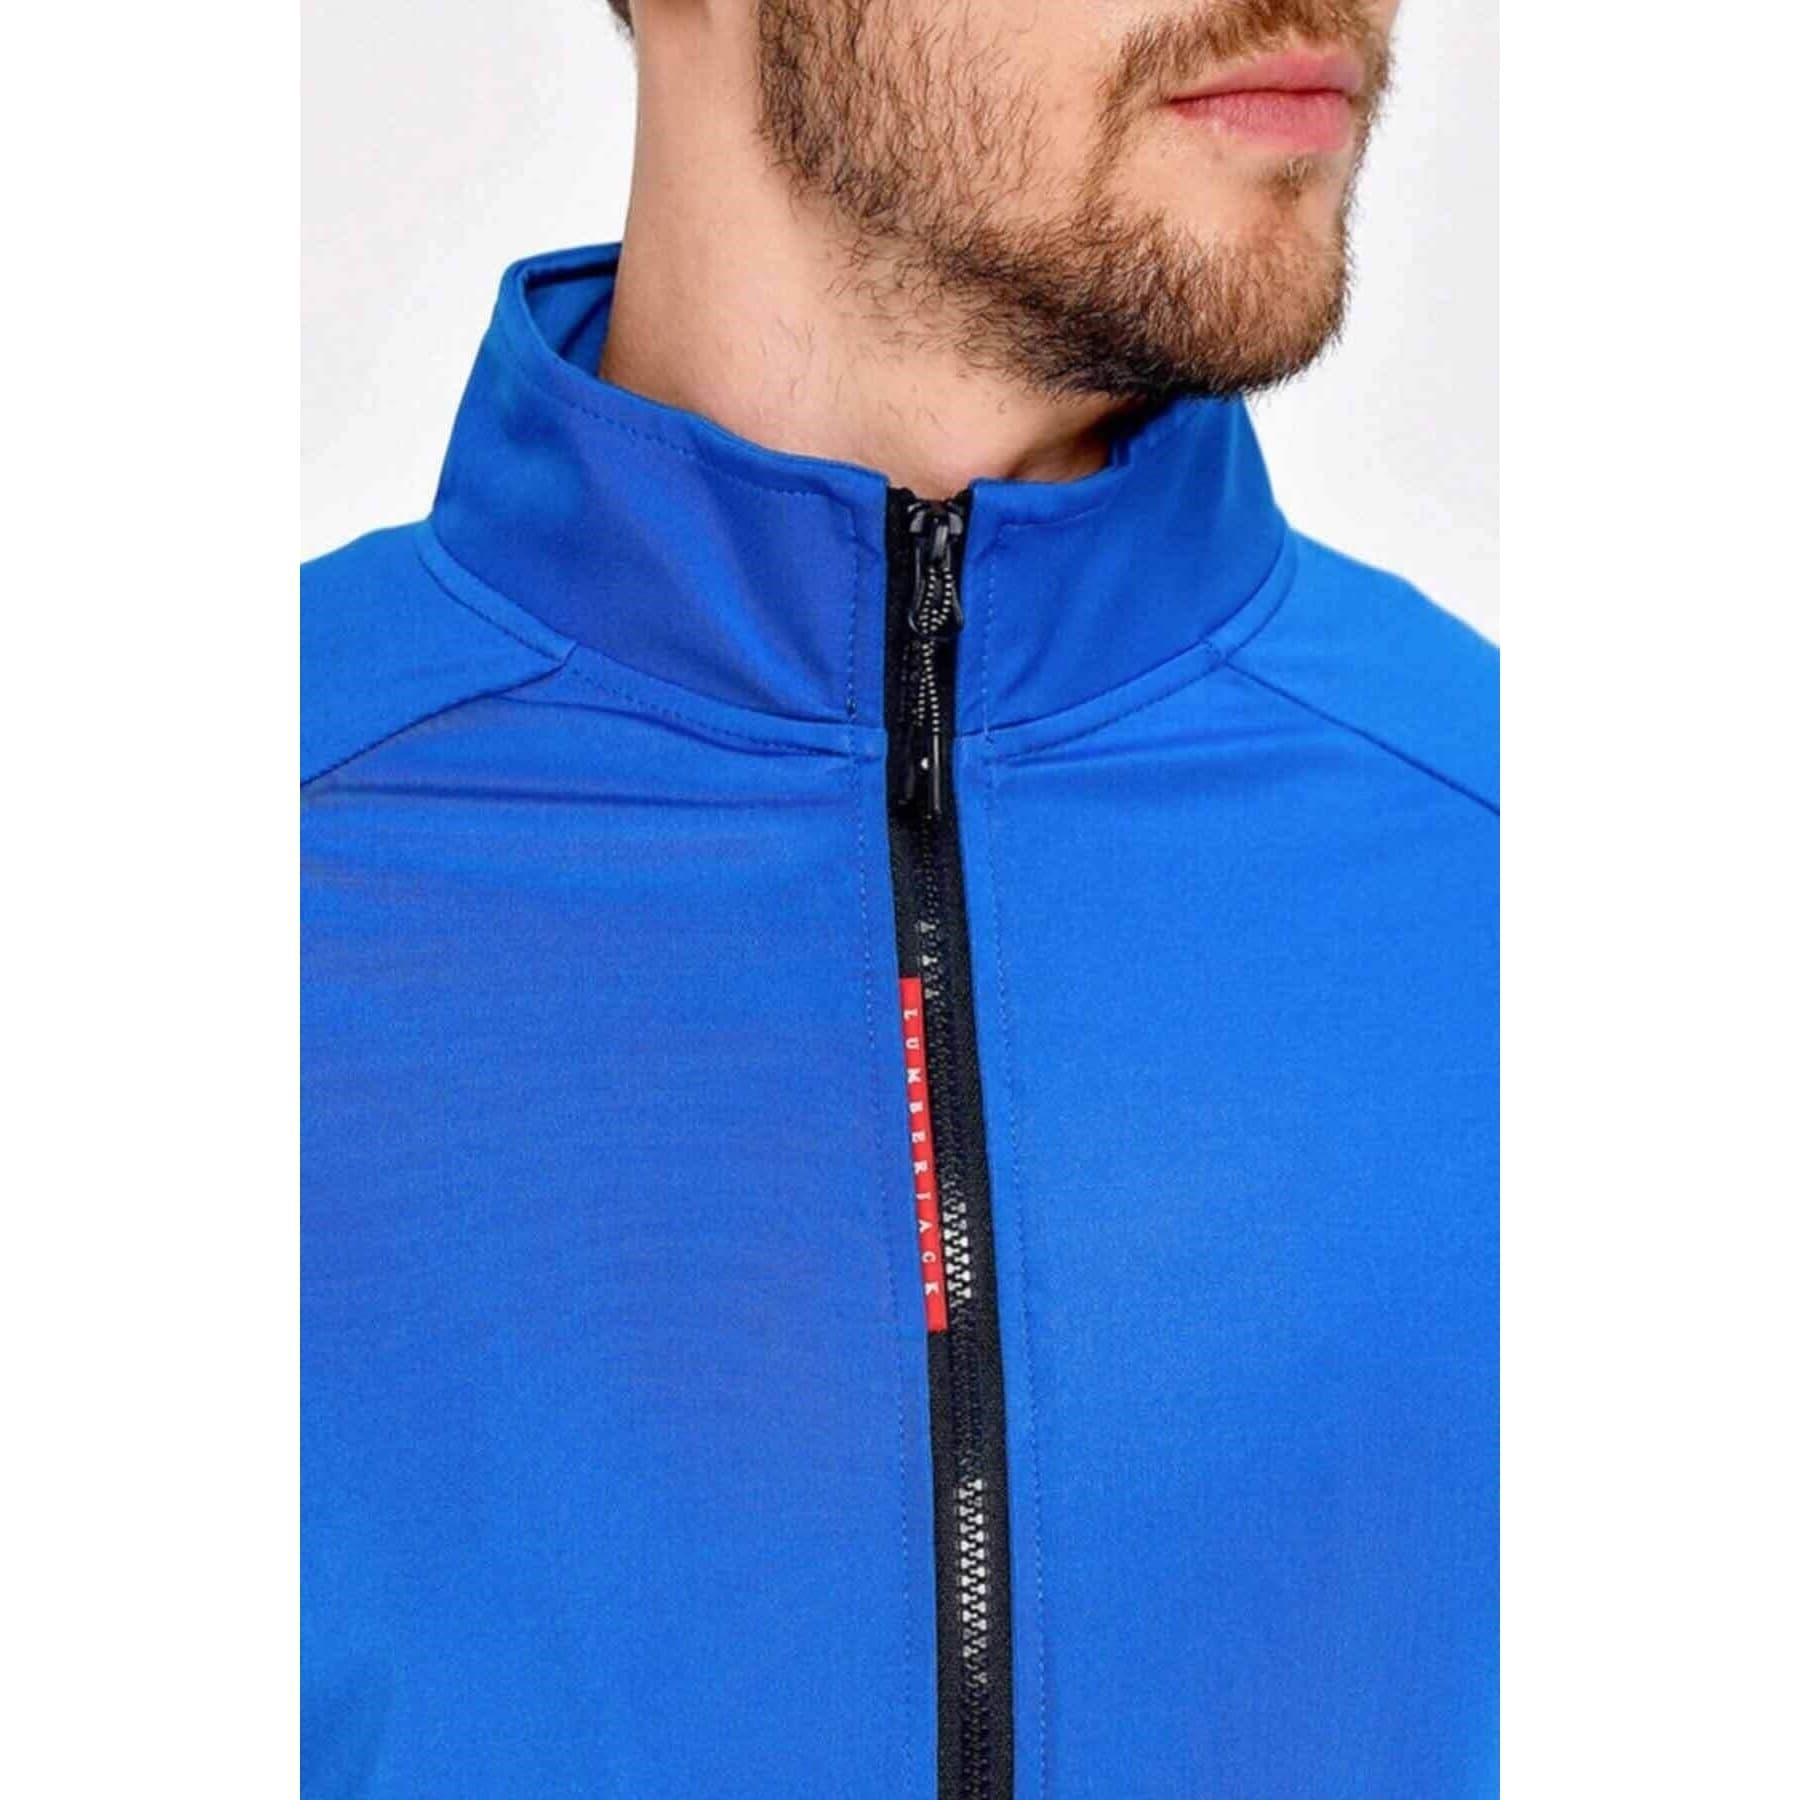 Elden Erkek Mavi Ceket (101005672)